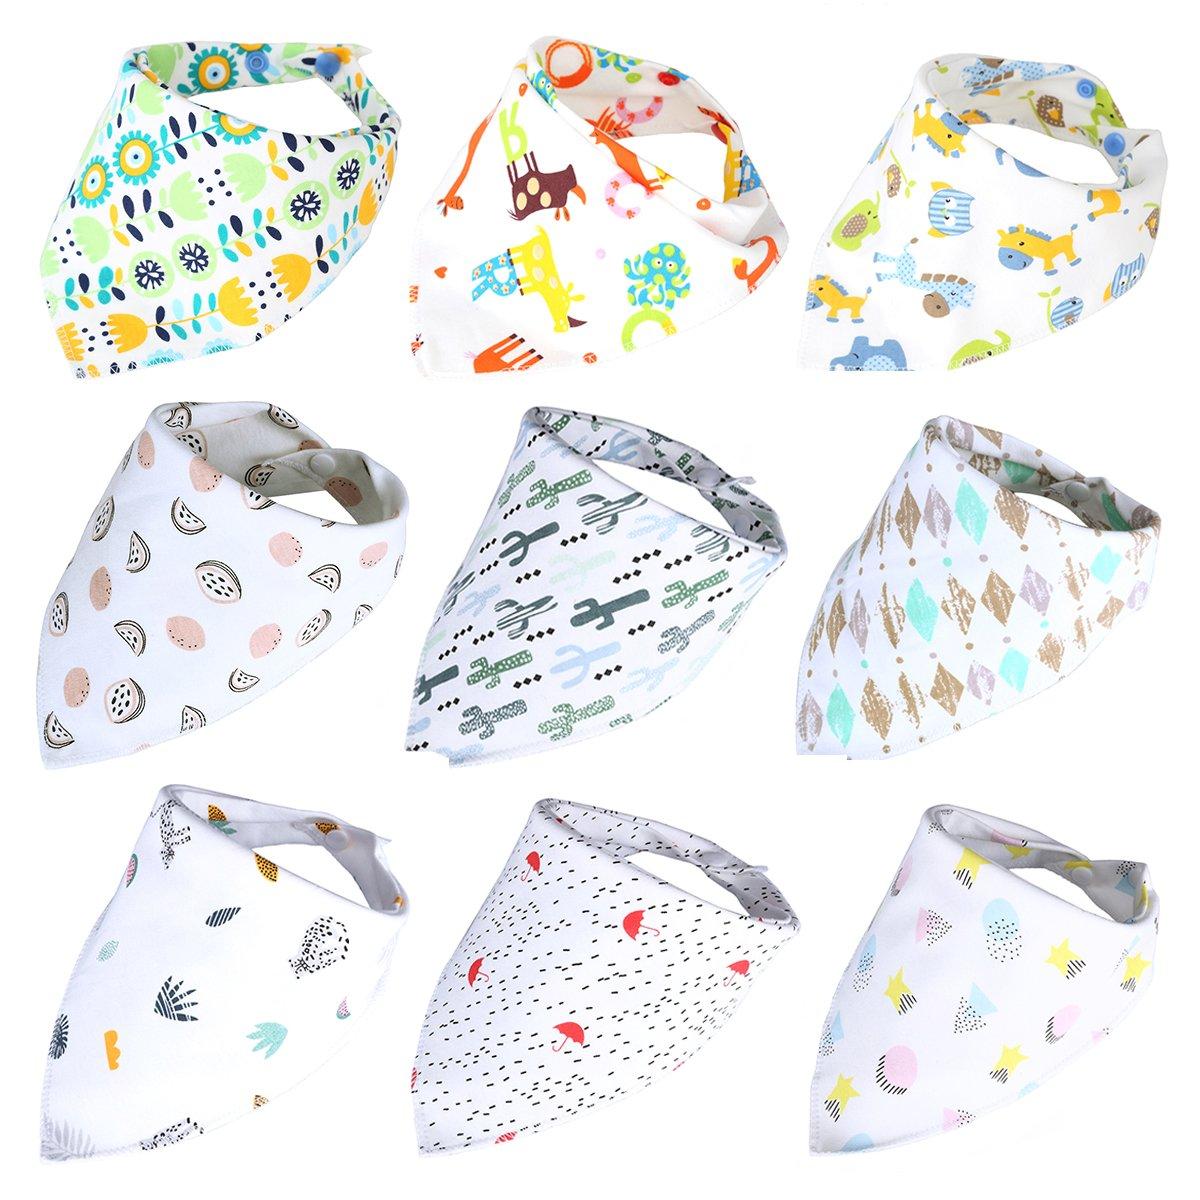 Baby Bandana Drool Bibs 9-Pack Gift Set Cute Floral Organic Cotton Baby Bibs for Boys, Girls Girls (Baby boy)